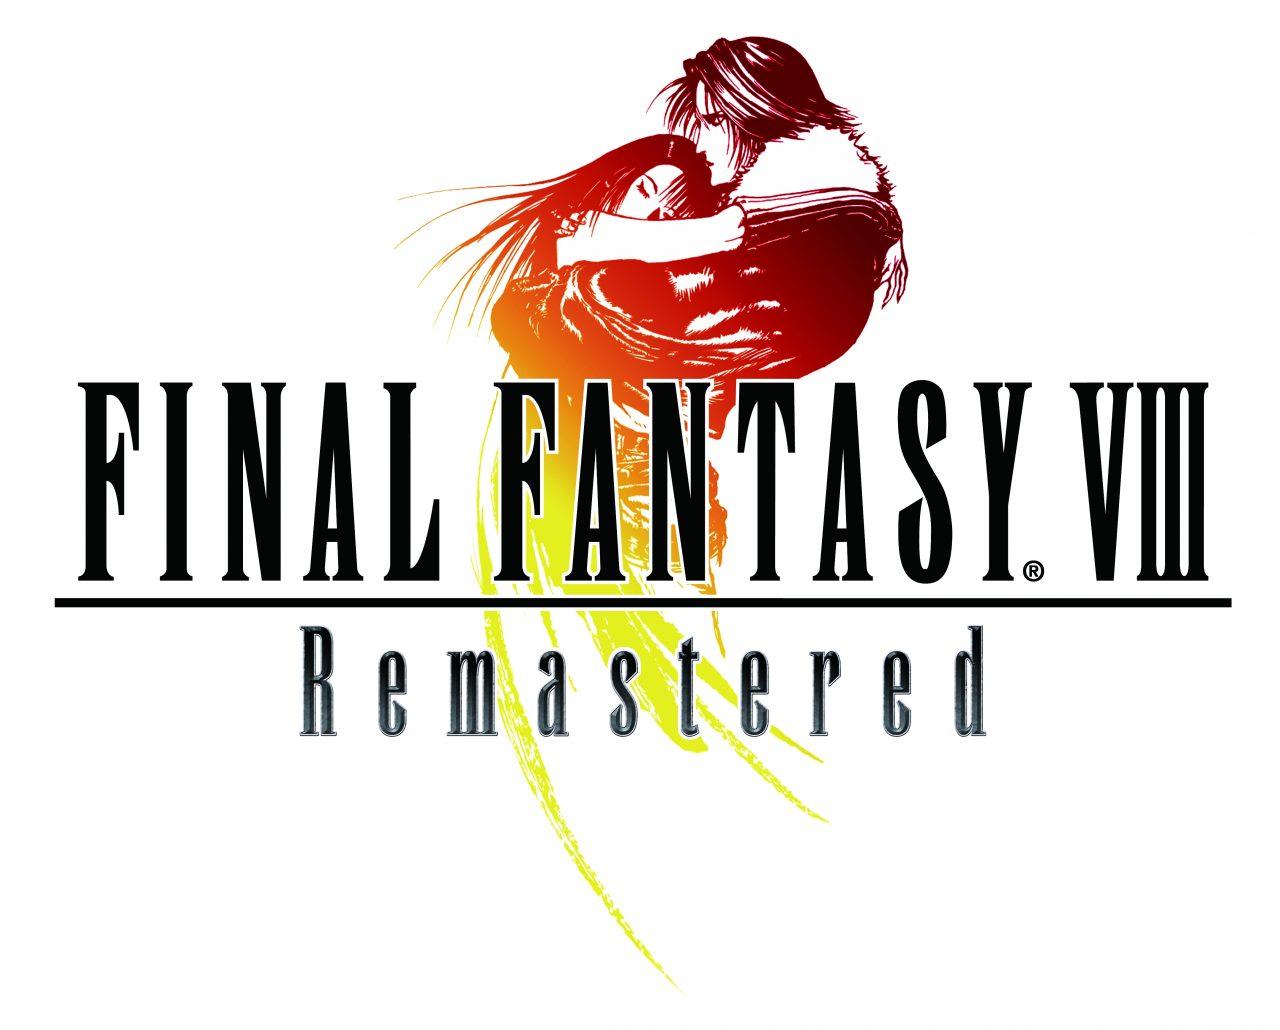 Final Fantasy VIII Remastered arriverà quest'anno! (video)